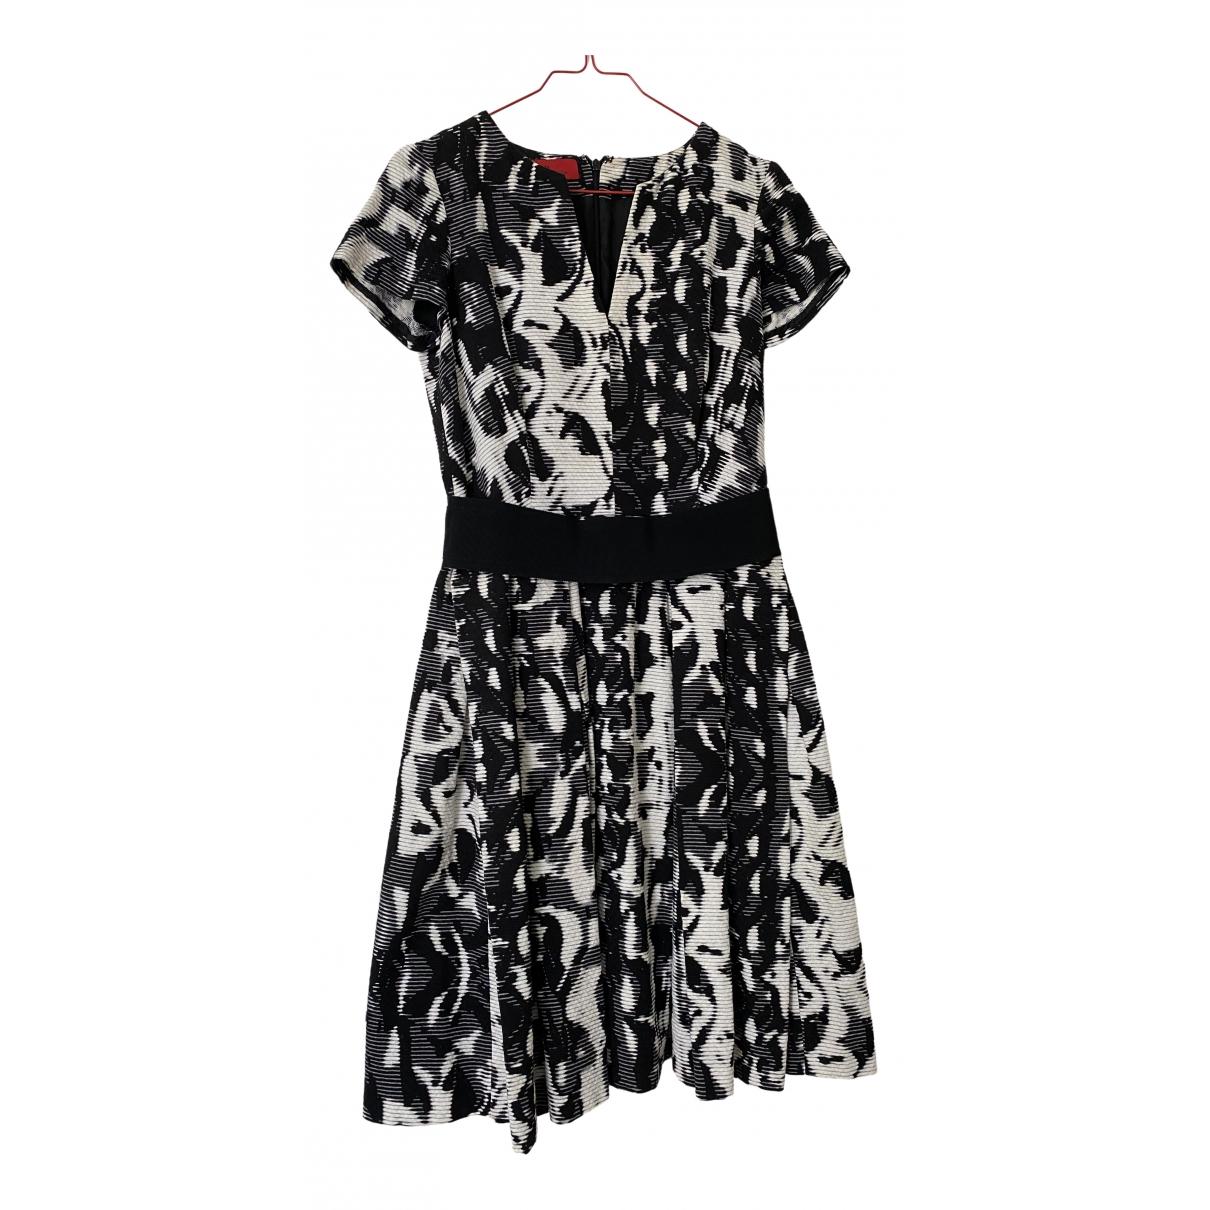 Carolina Herrera \N Kleid in  Schwarz Baumwolle